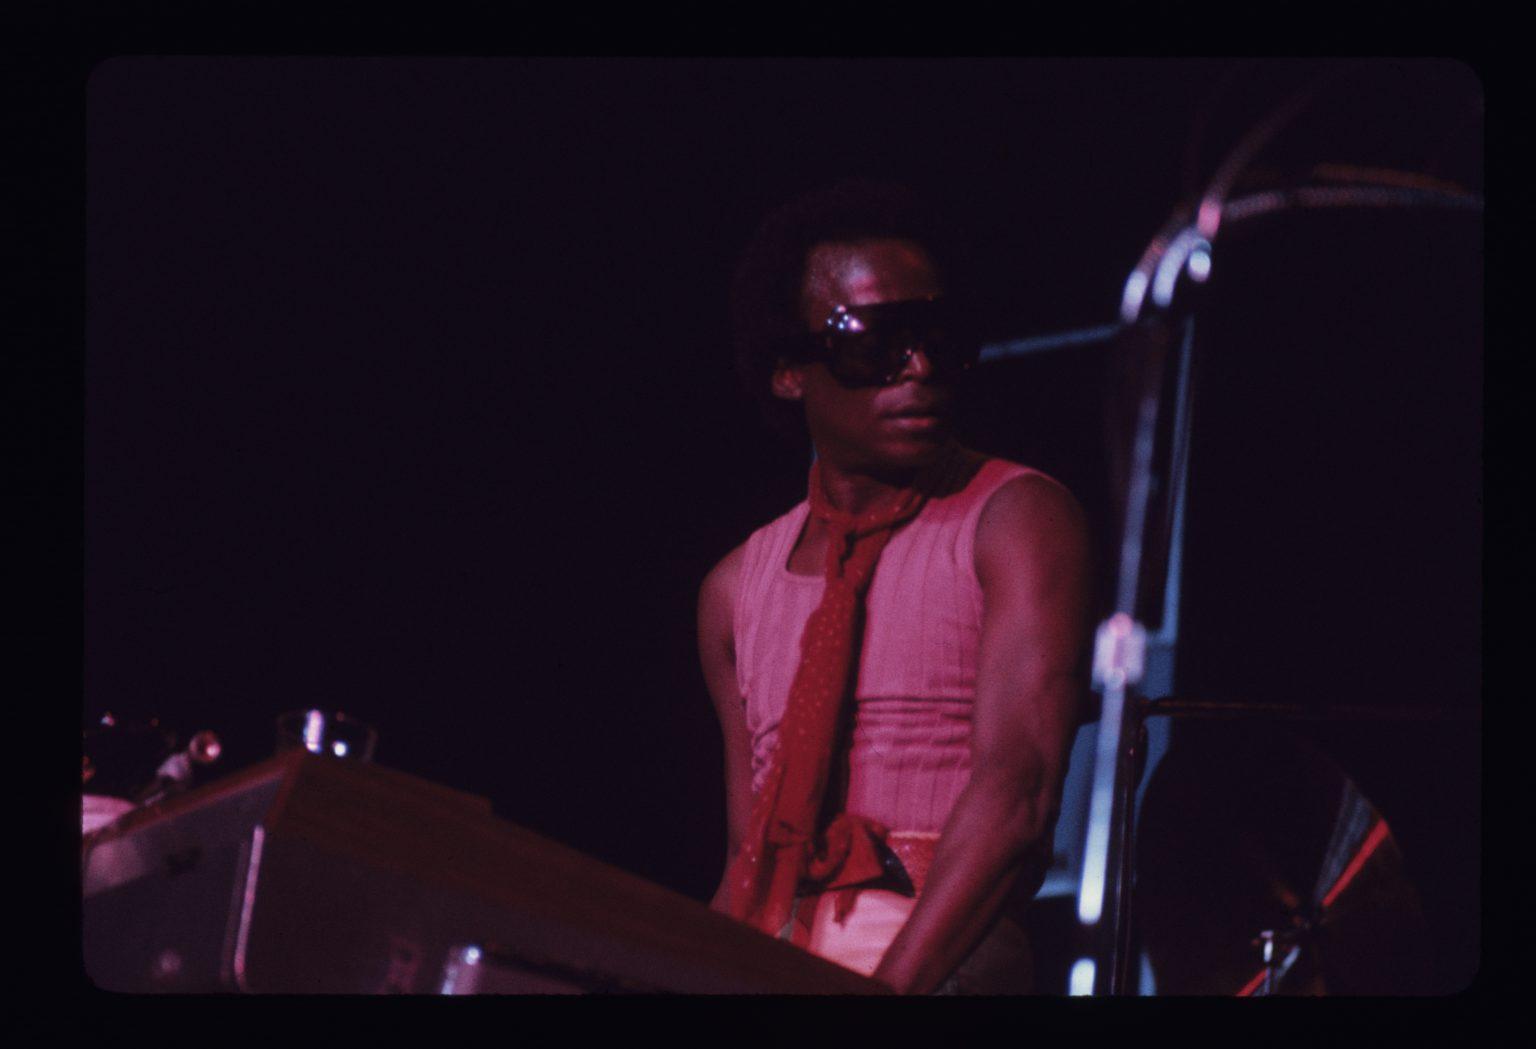 JazzTimes 10: Miles Davis' Live Albums